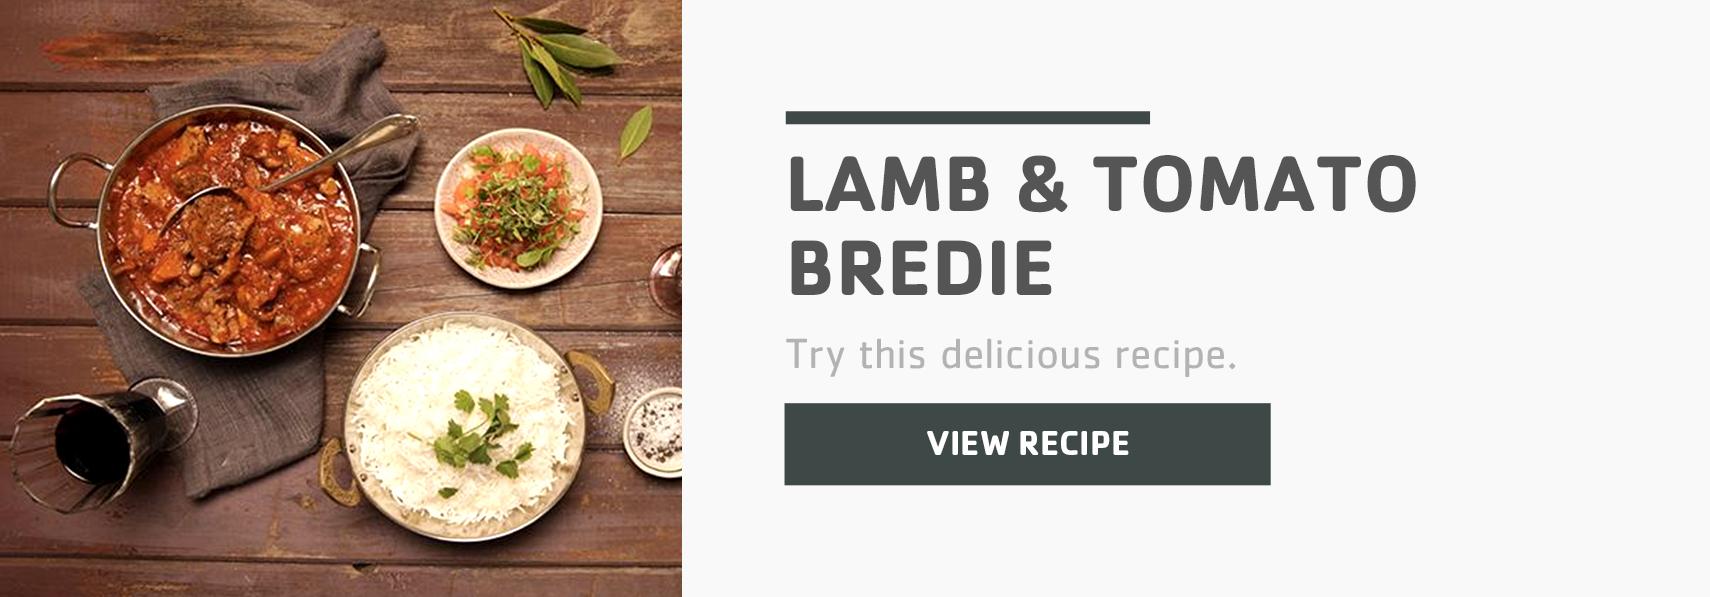 Lamb-&-Tomato-Bredie.jpg